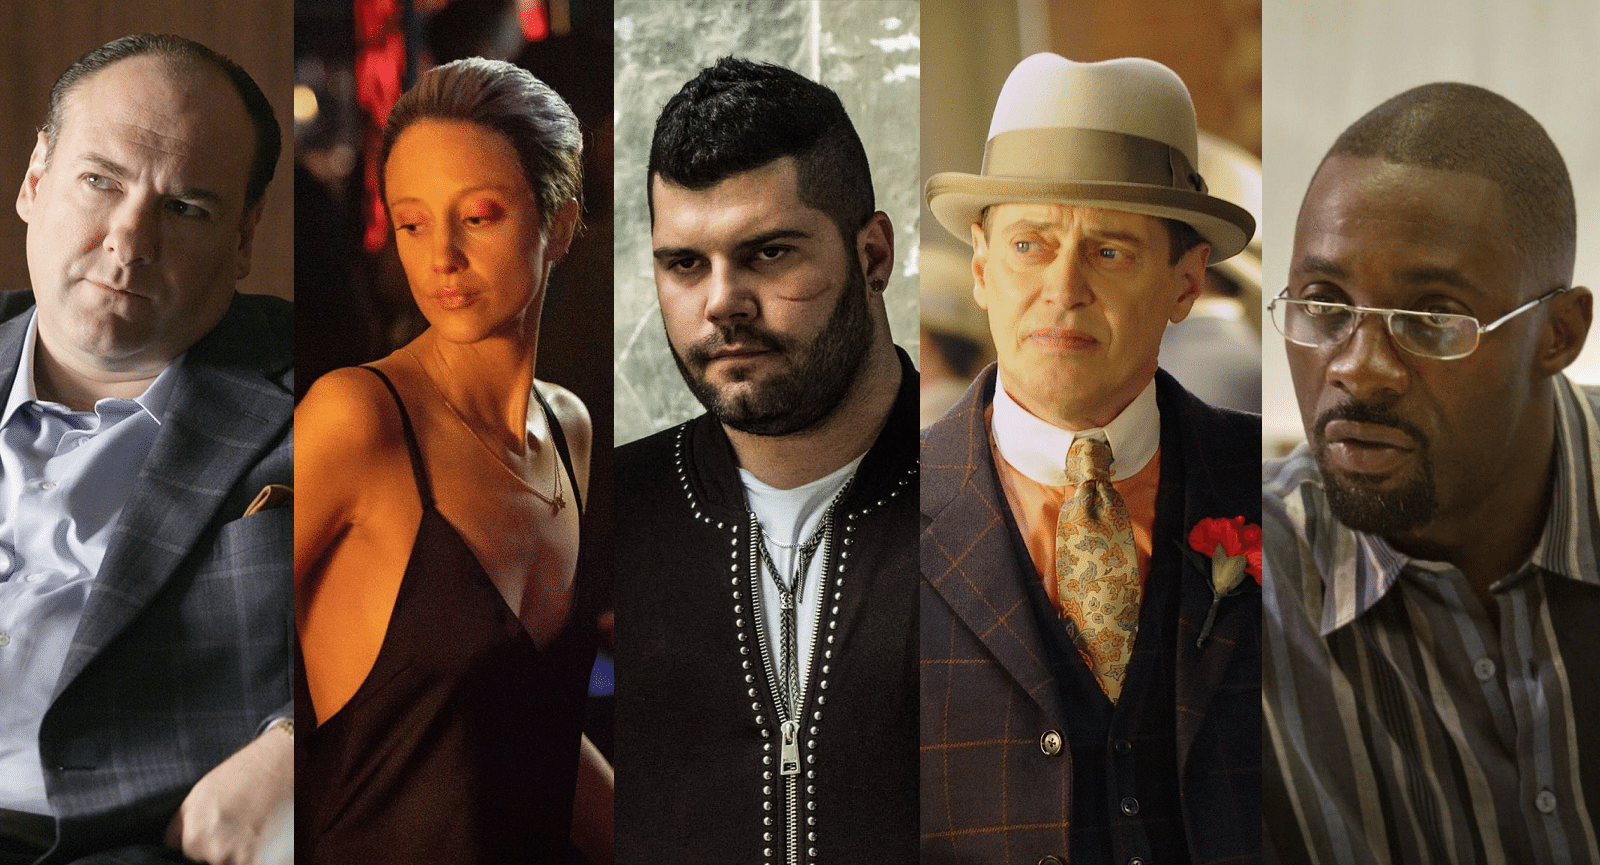 De Tony Soprano à Gennaro Savastano, nos meilleurs mafieux en série